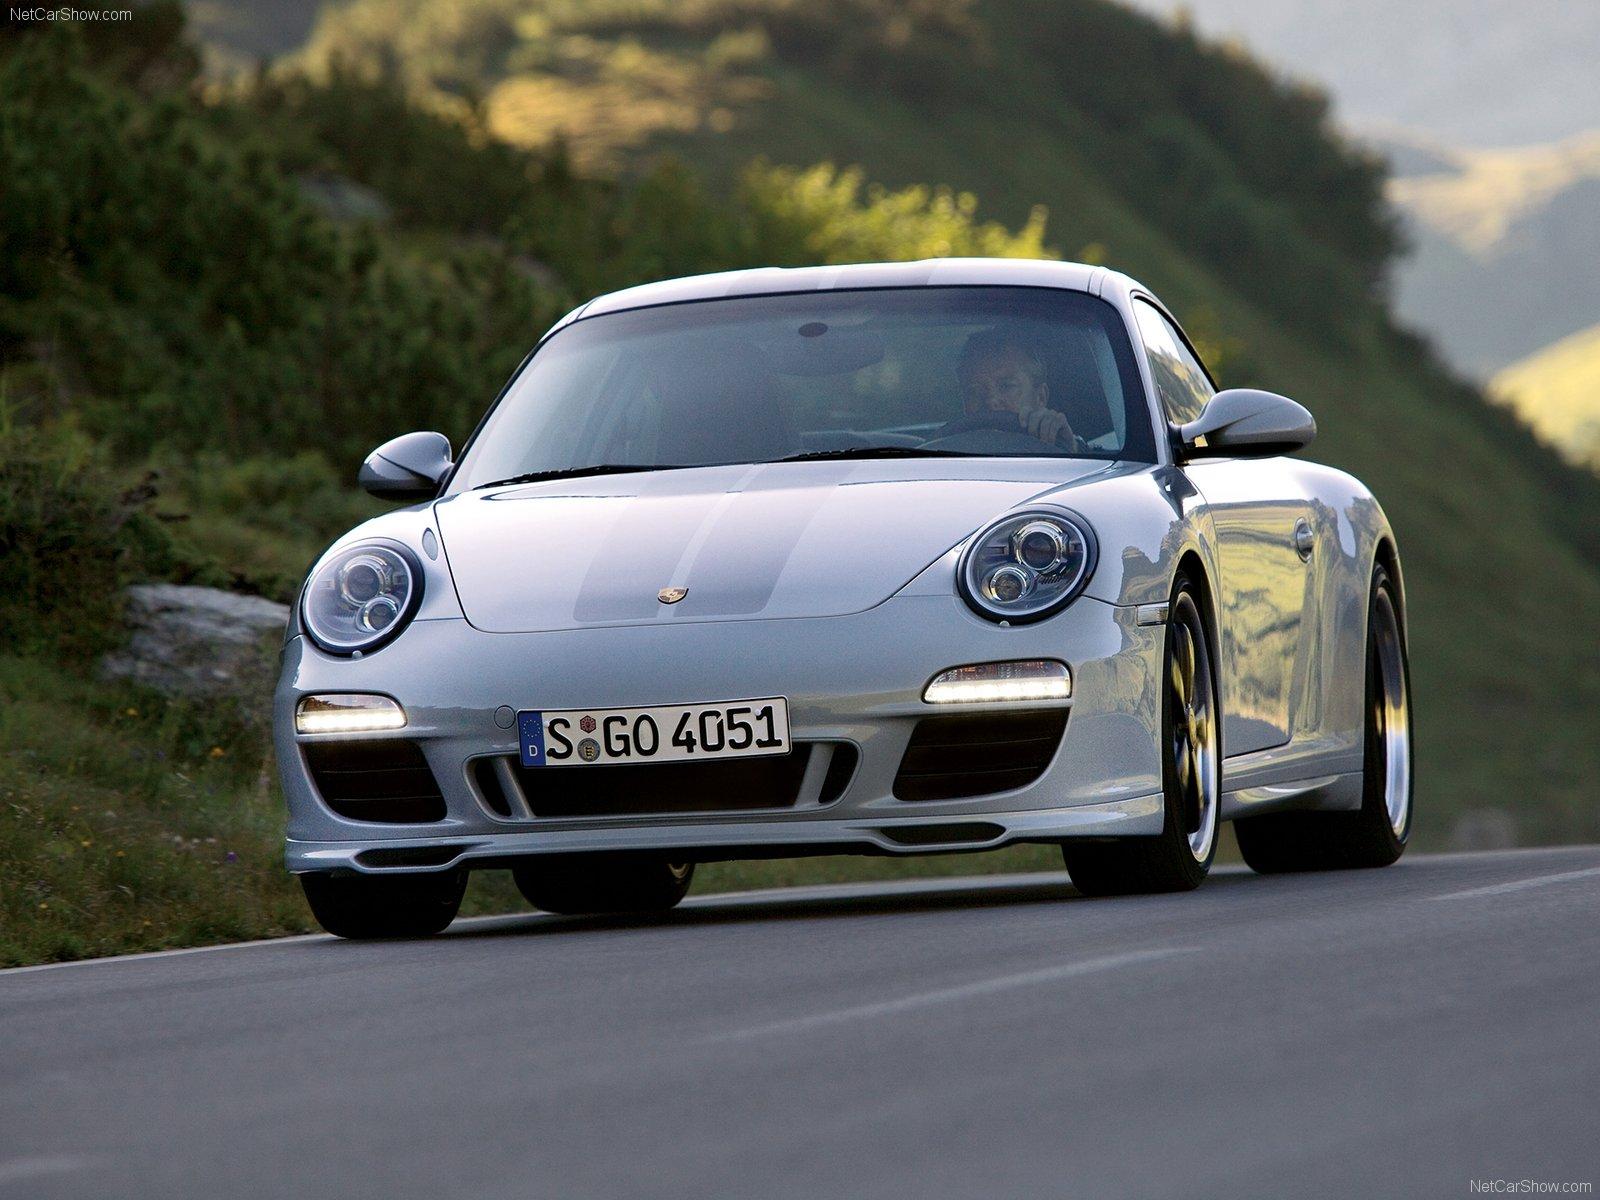 Porsche 911 Sport Classic Wallpaper: 2010 White Porsche 911 Sport Classic Wallpapers